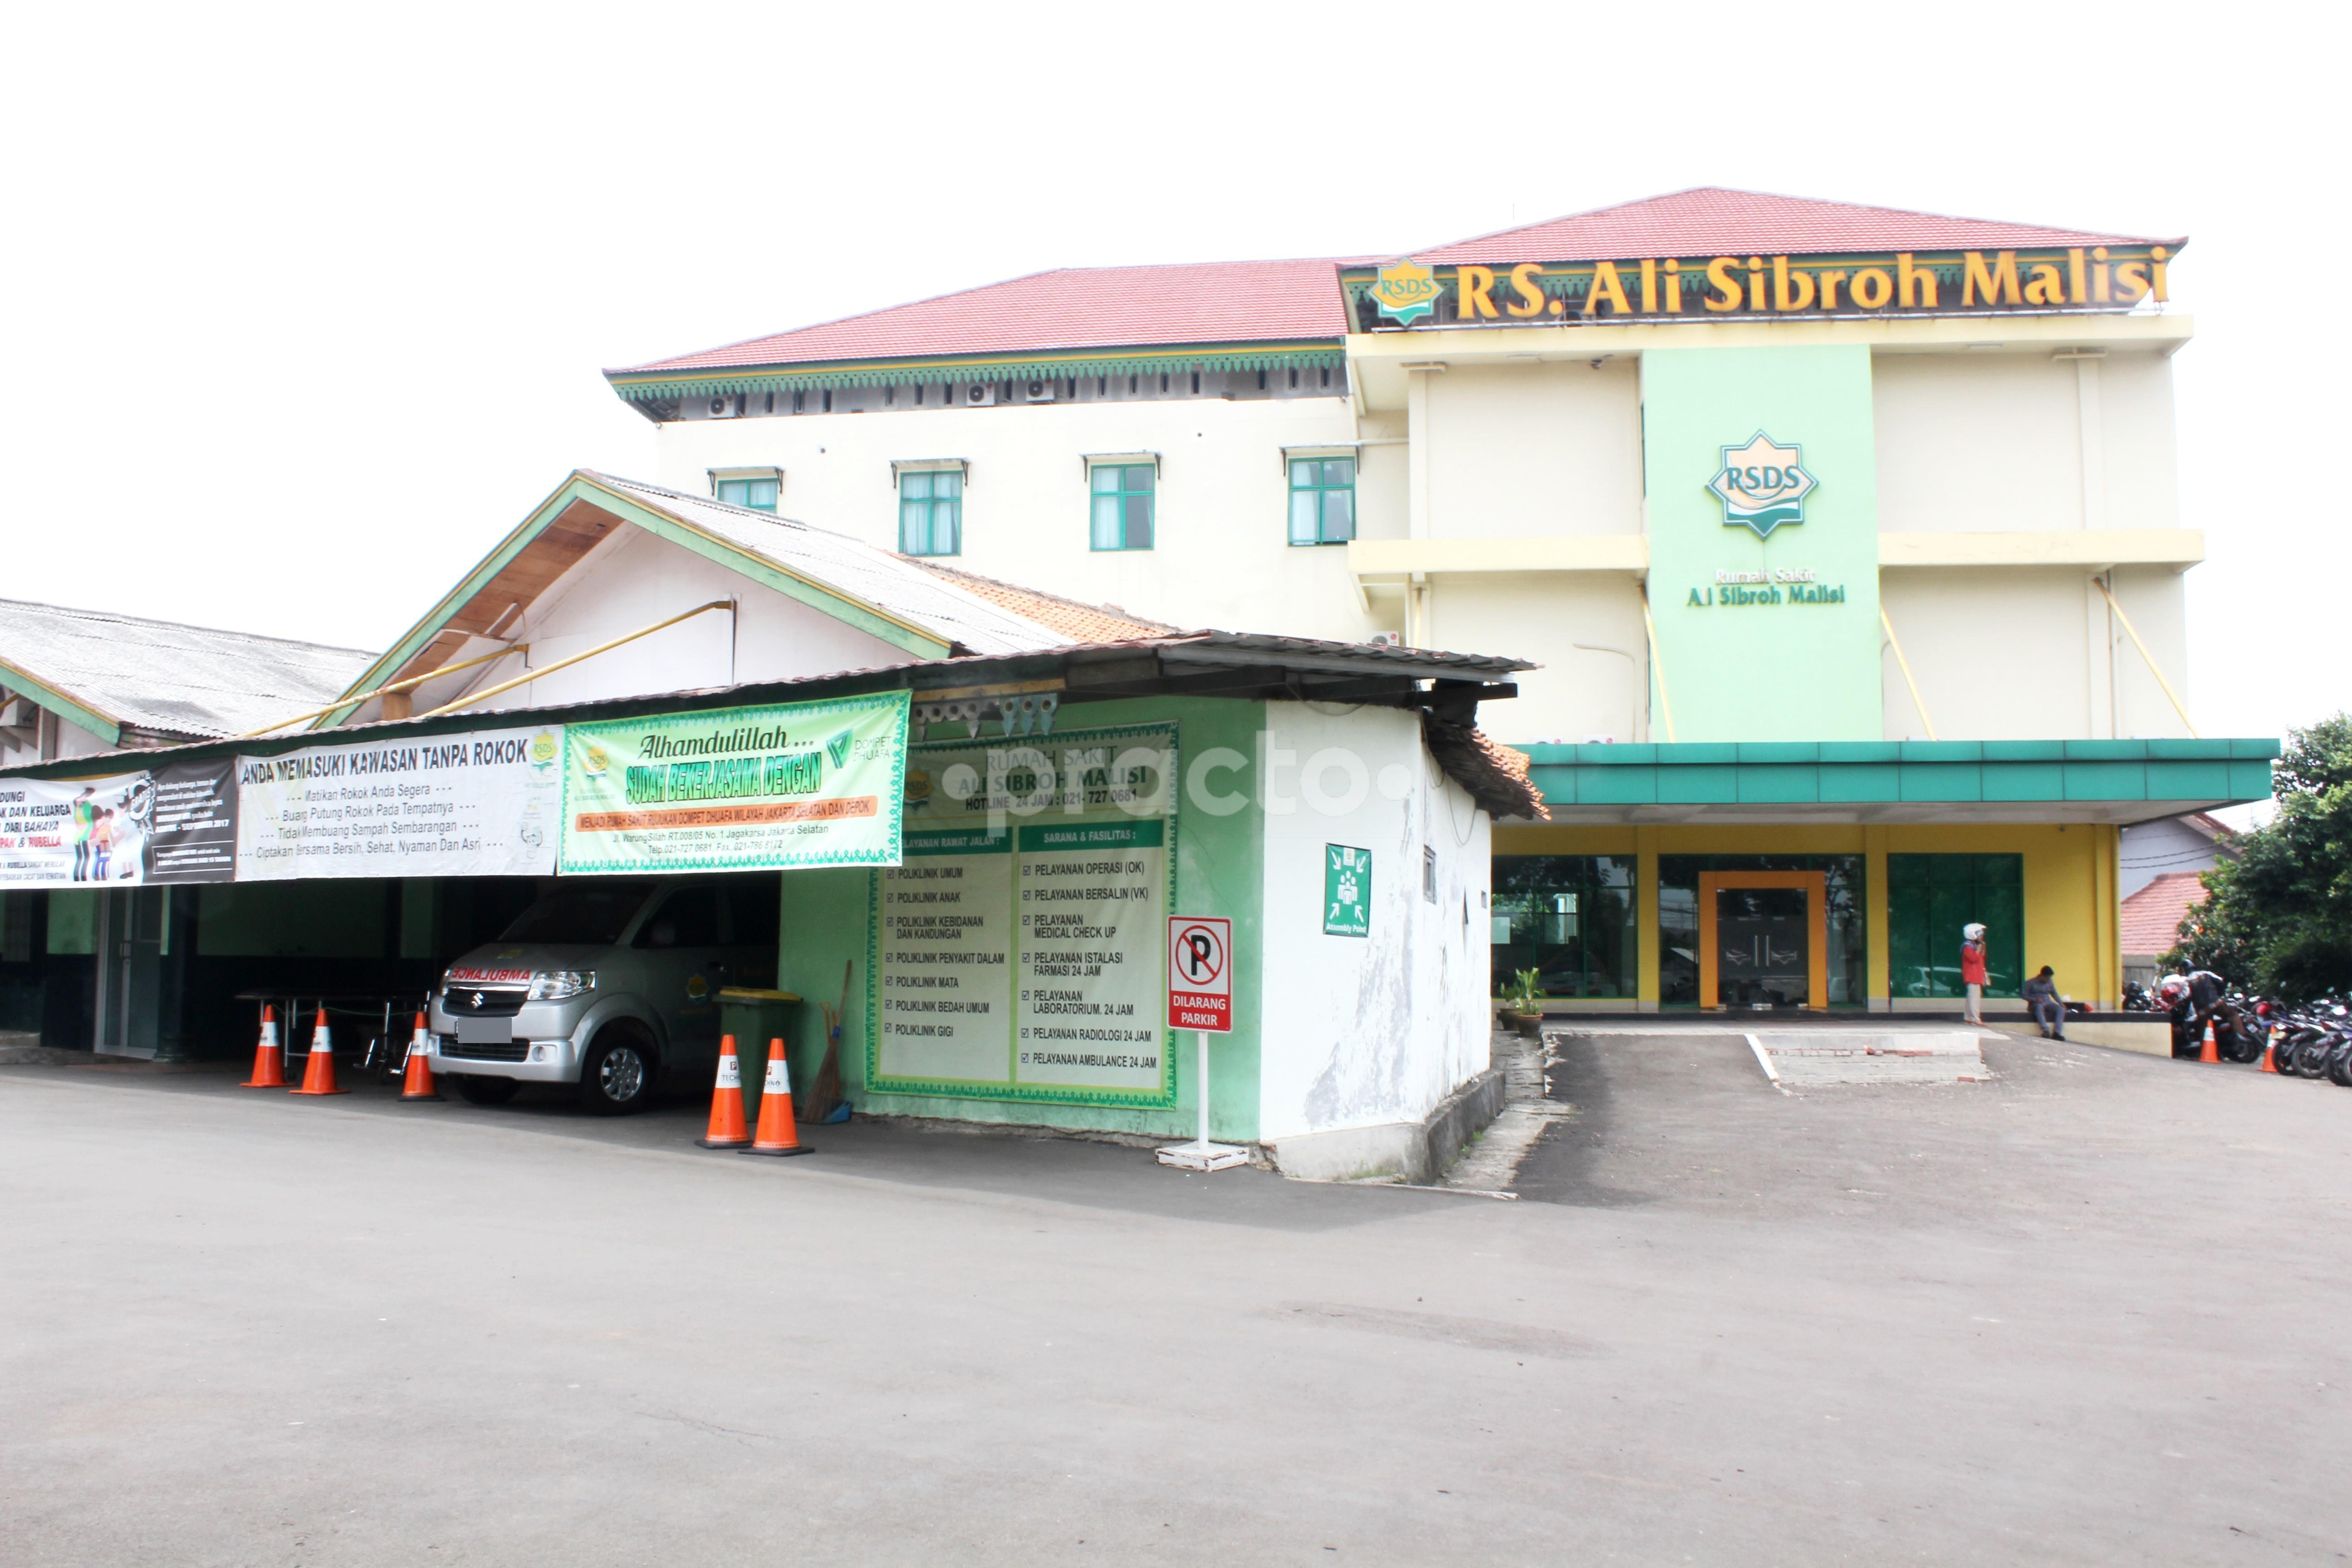 Alamat Rumah Sakit Andika Warung Sila - Seputaran Rumah